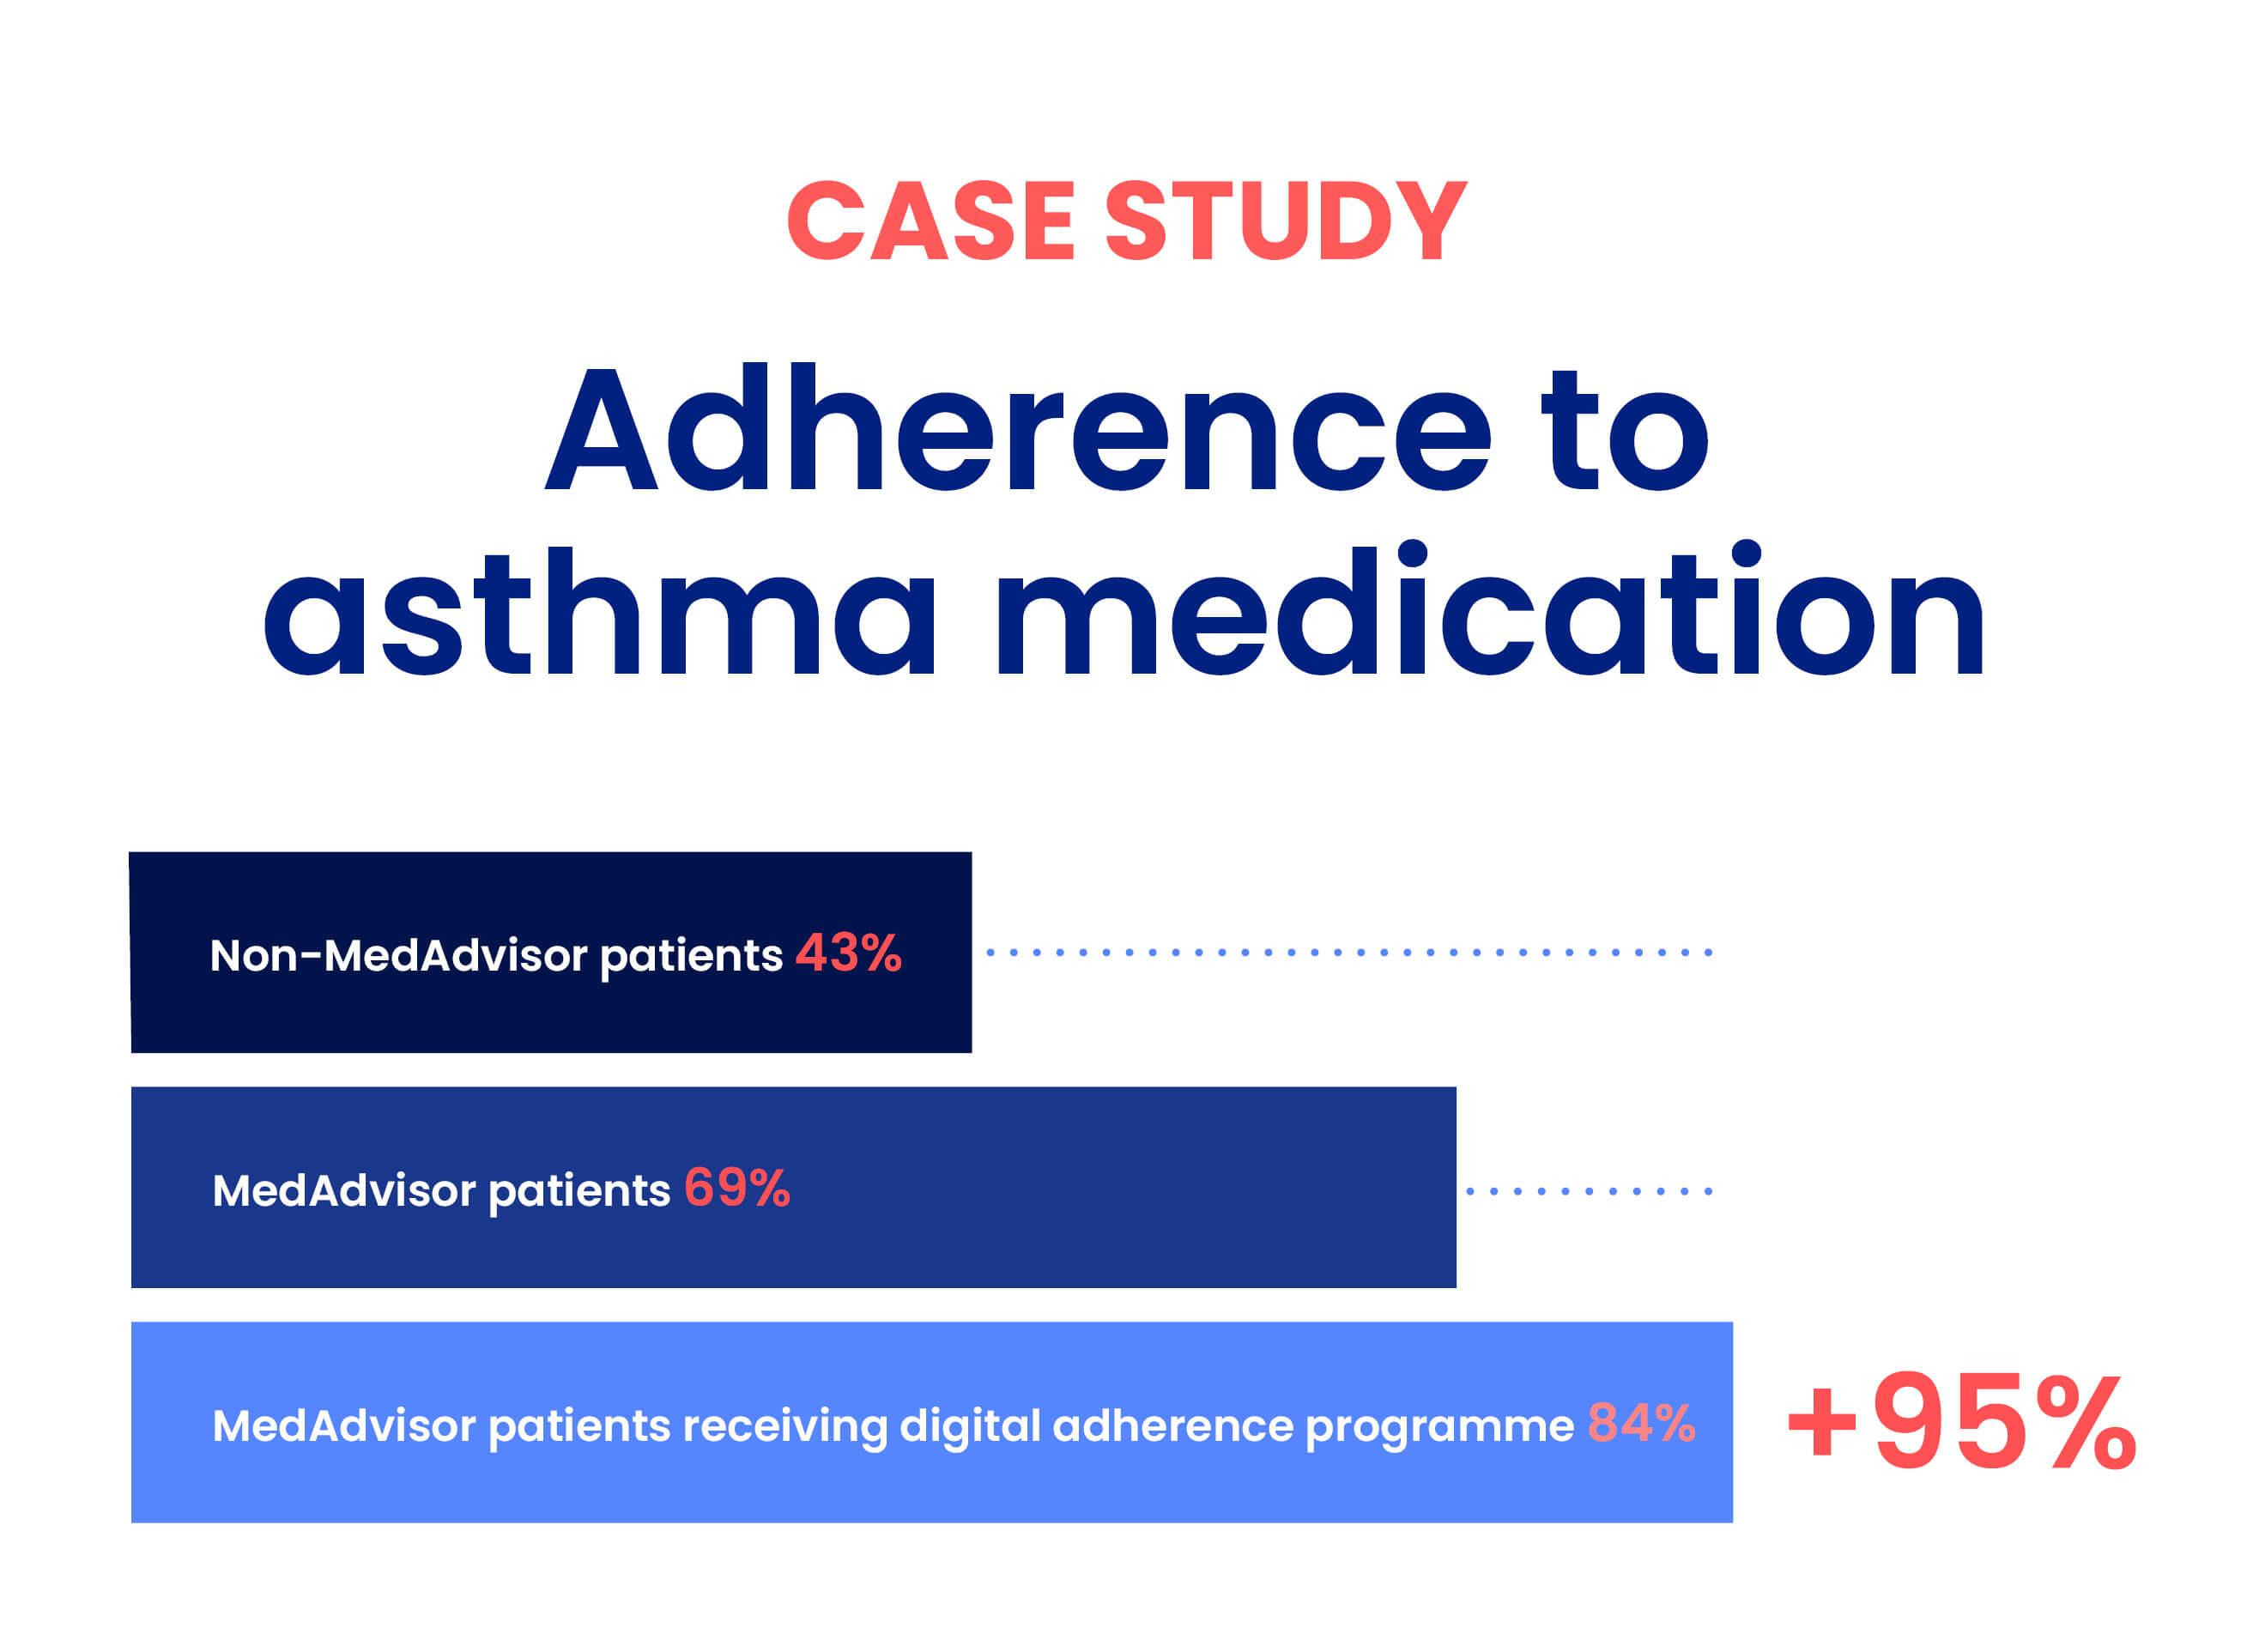 Adherence to asthma medication